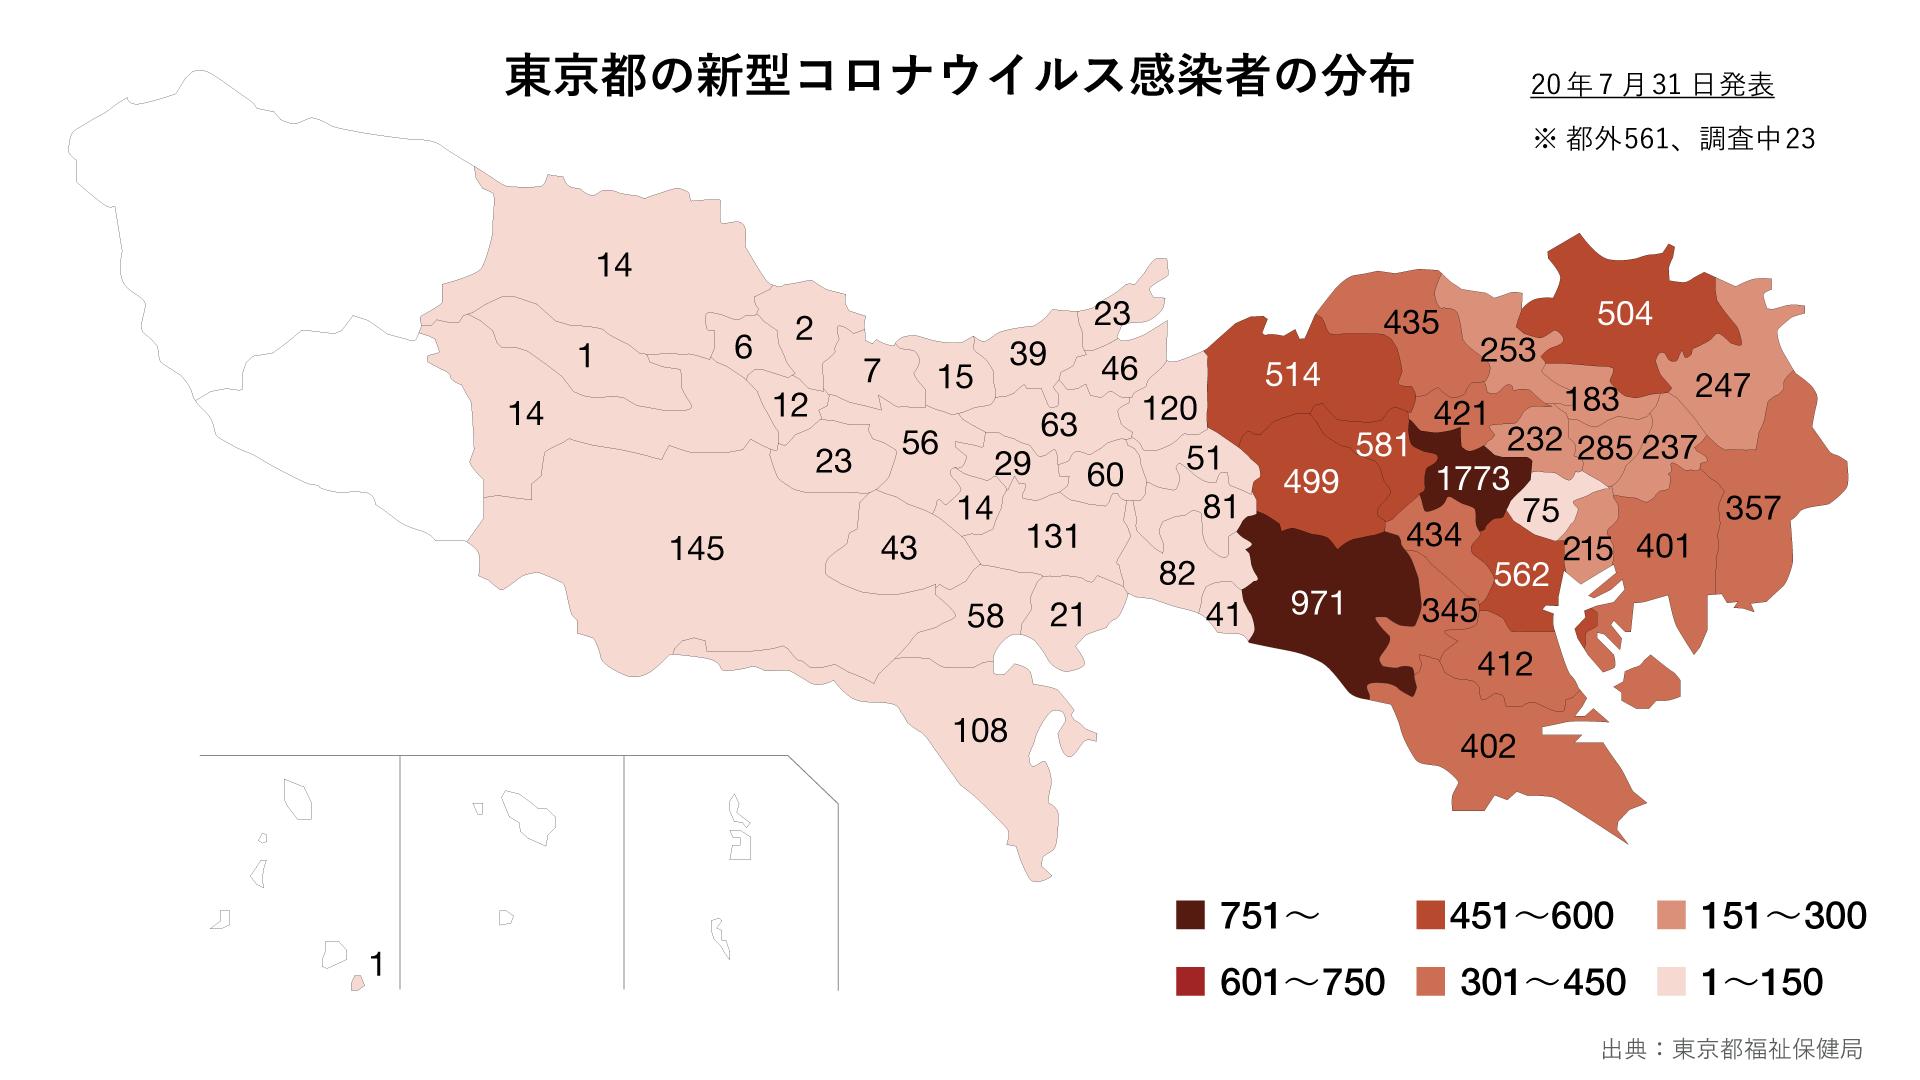 東京 都 自治体 別 コロナ 感染 者 数 東京都の公表情報(都内の区市町村別患者数等):新宿区